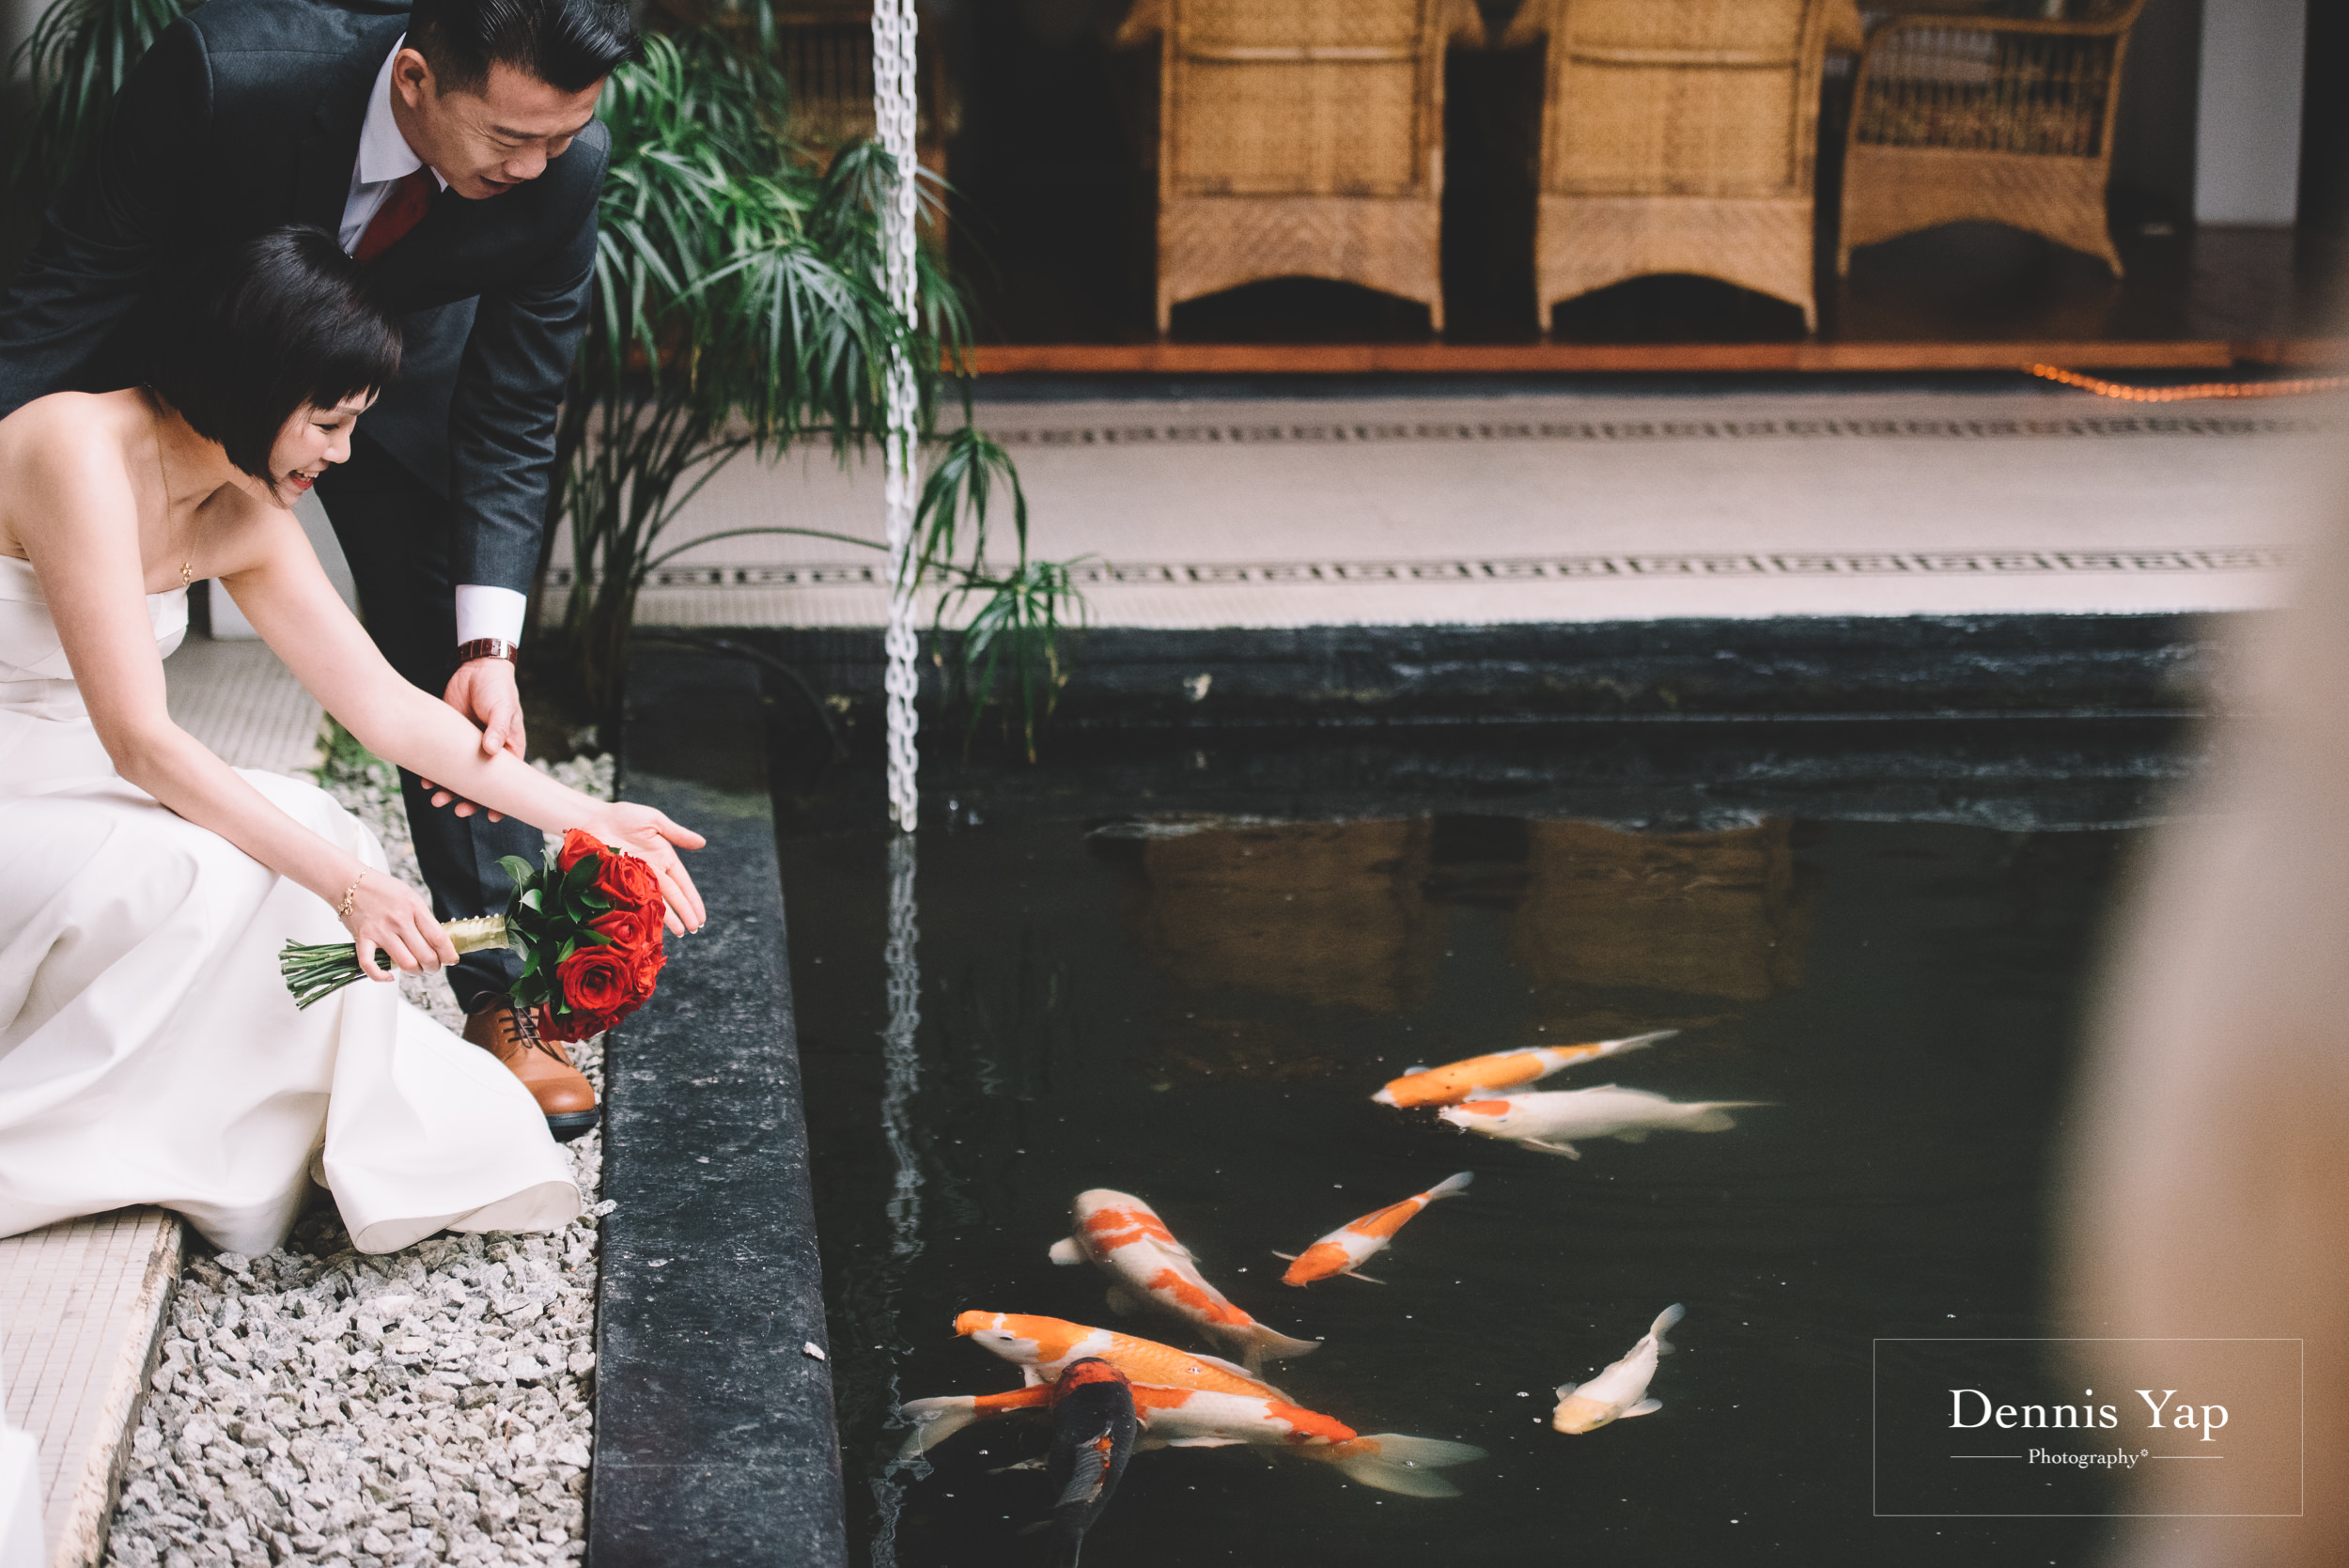 boon weng cyndy love family values pre wedding cameron highlands smoke house dennis yap photography-68.jpg